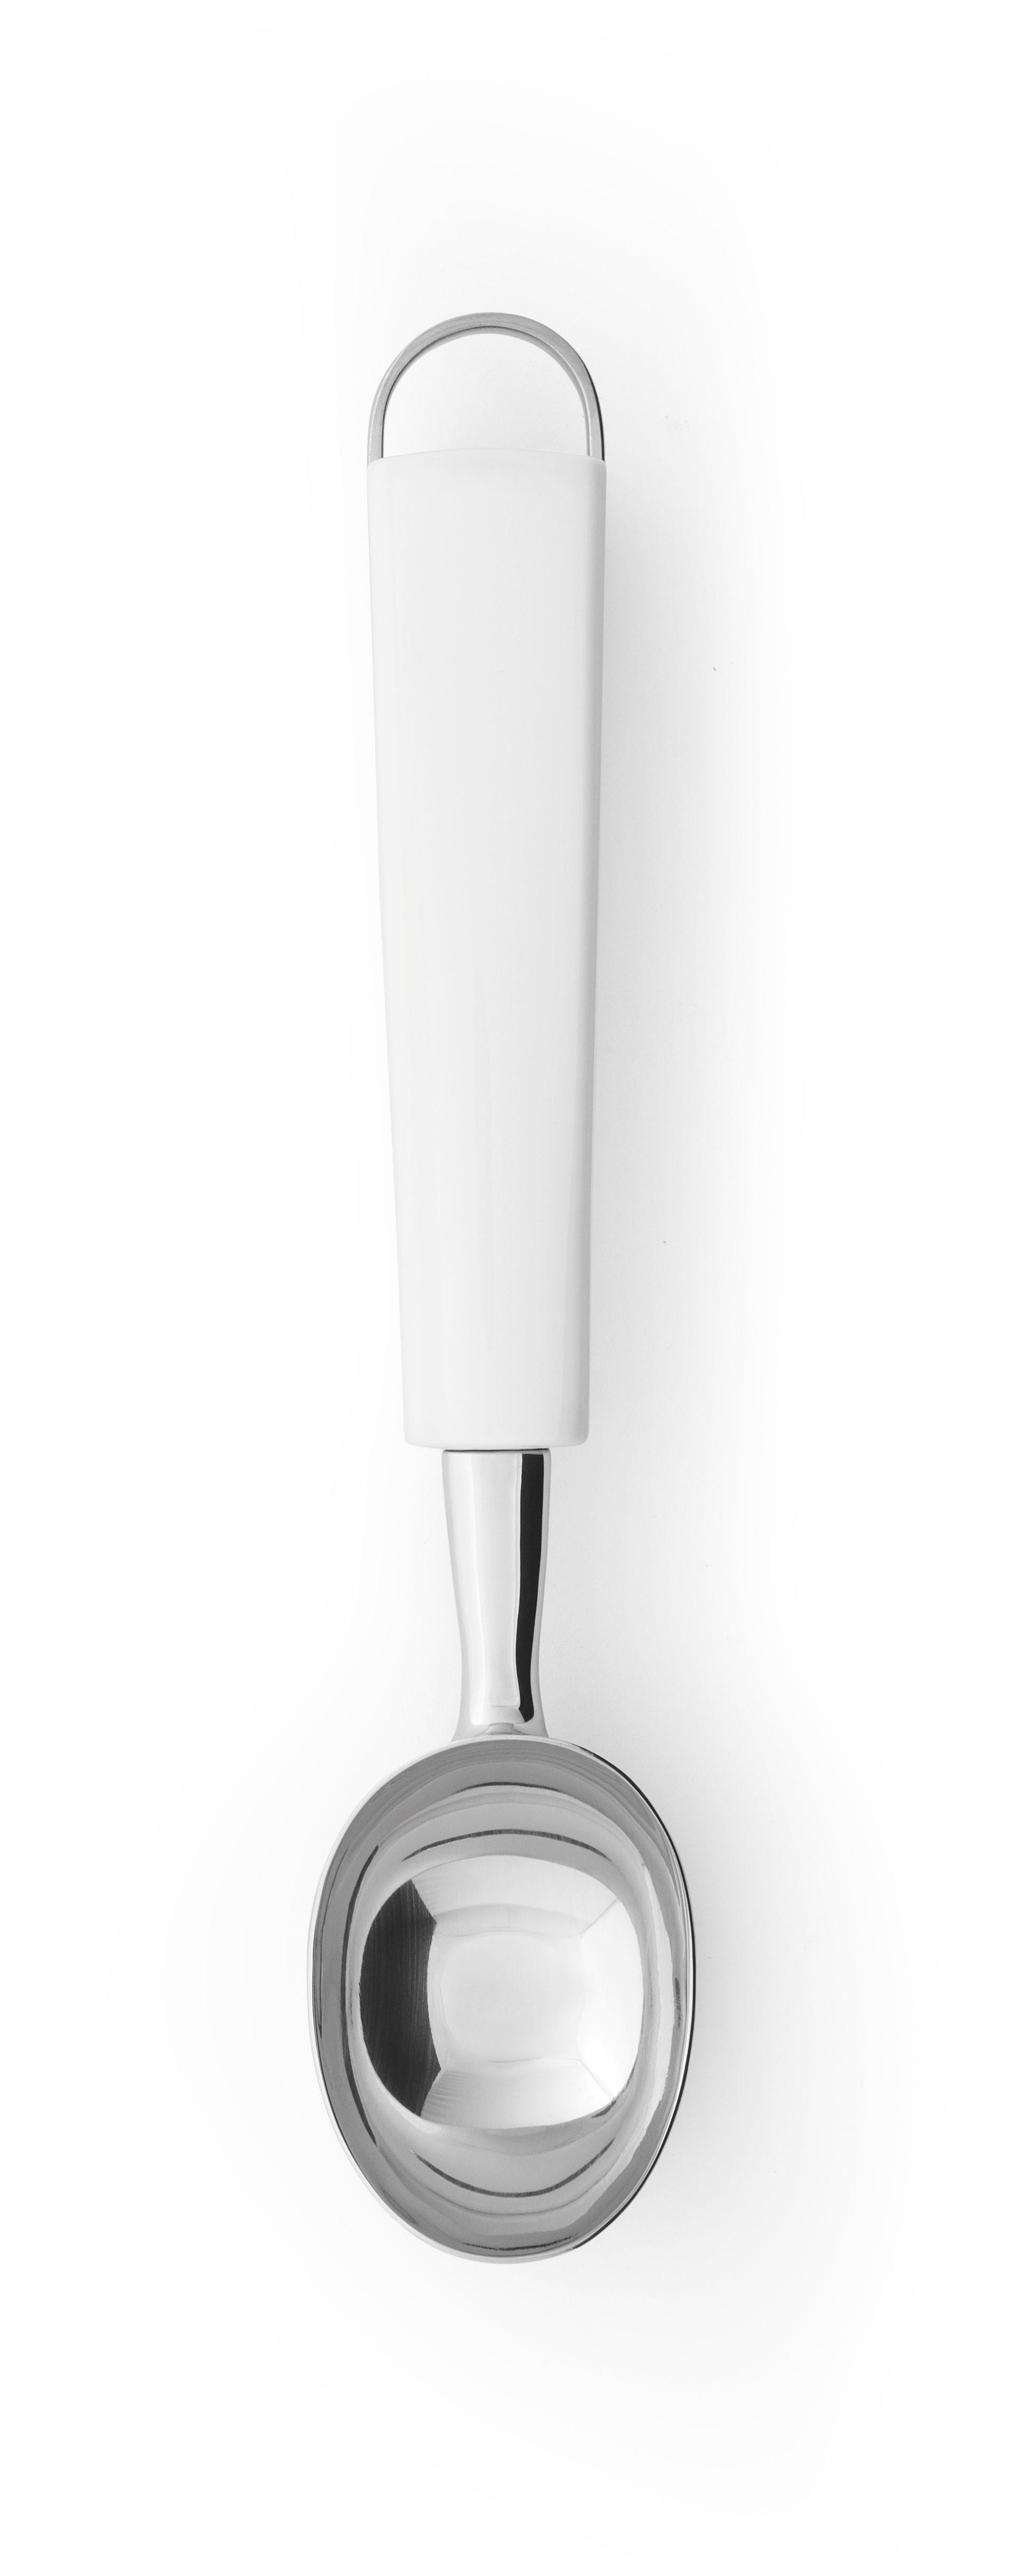 BRABANTIA Κουτάλι Σερβιρίσματος Παγωτού  με Λευκή Λαβή ESSENTIAL LINE - 080.4003/46